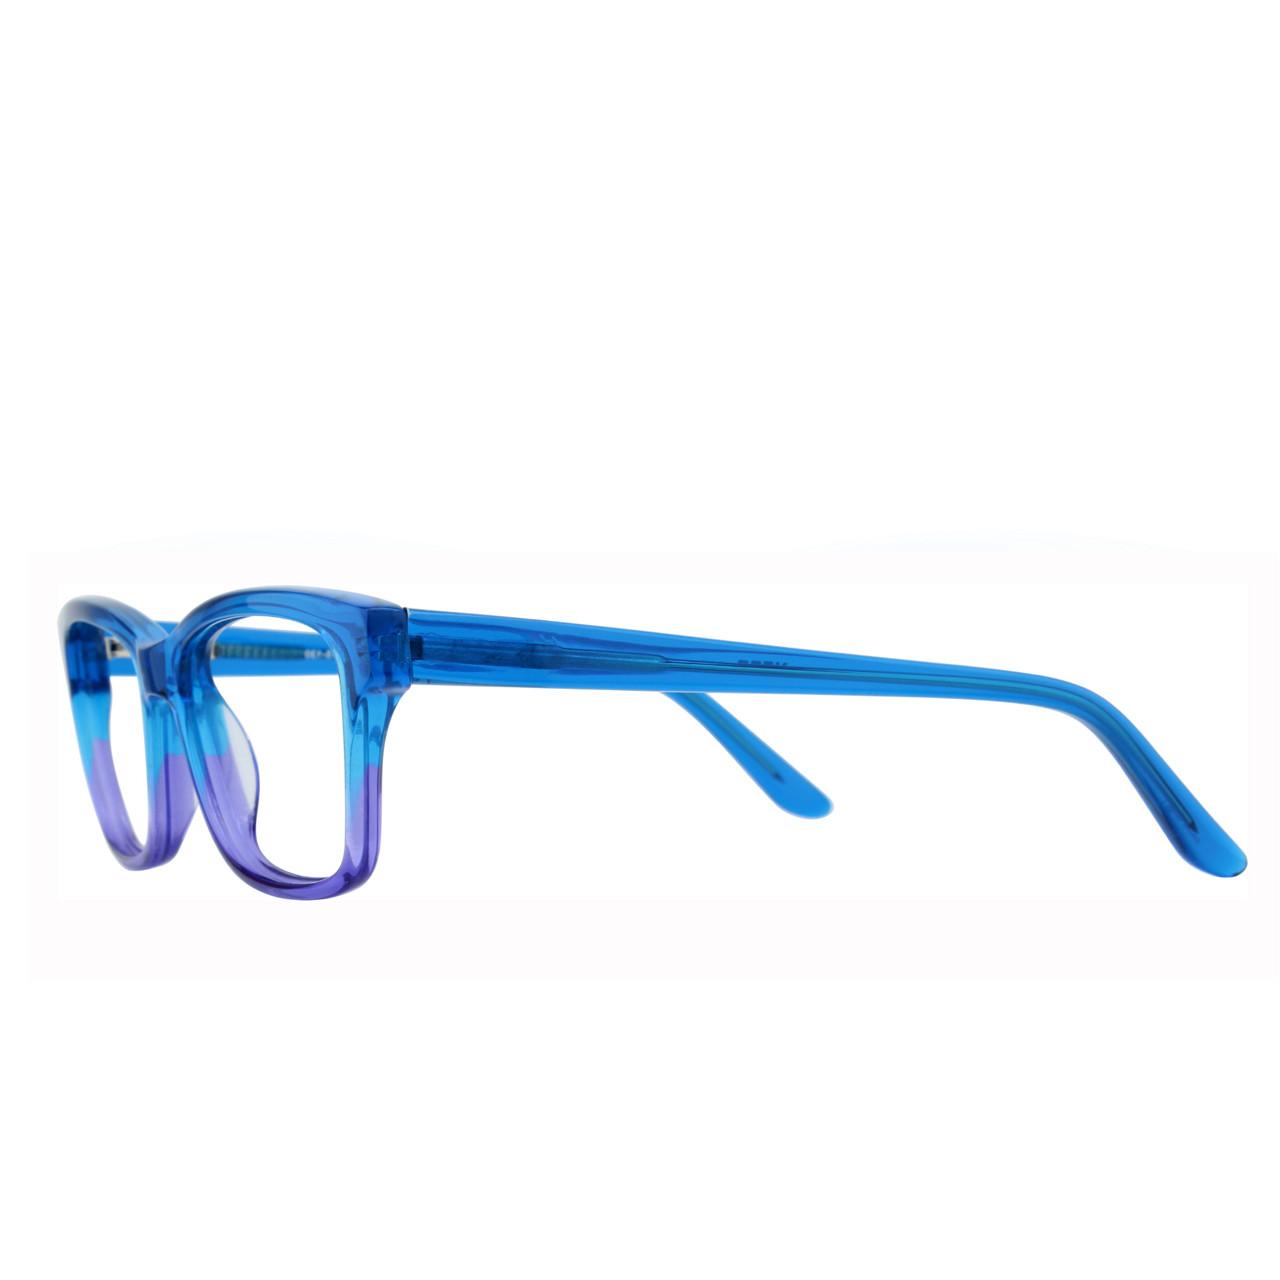 GEEK Eyewear style MENTOR Junior Collection